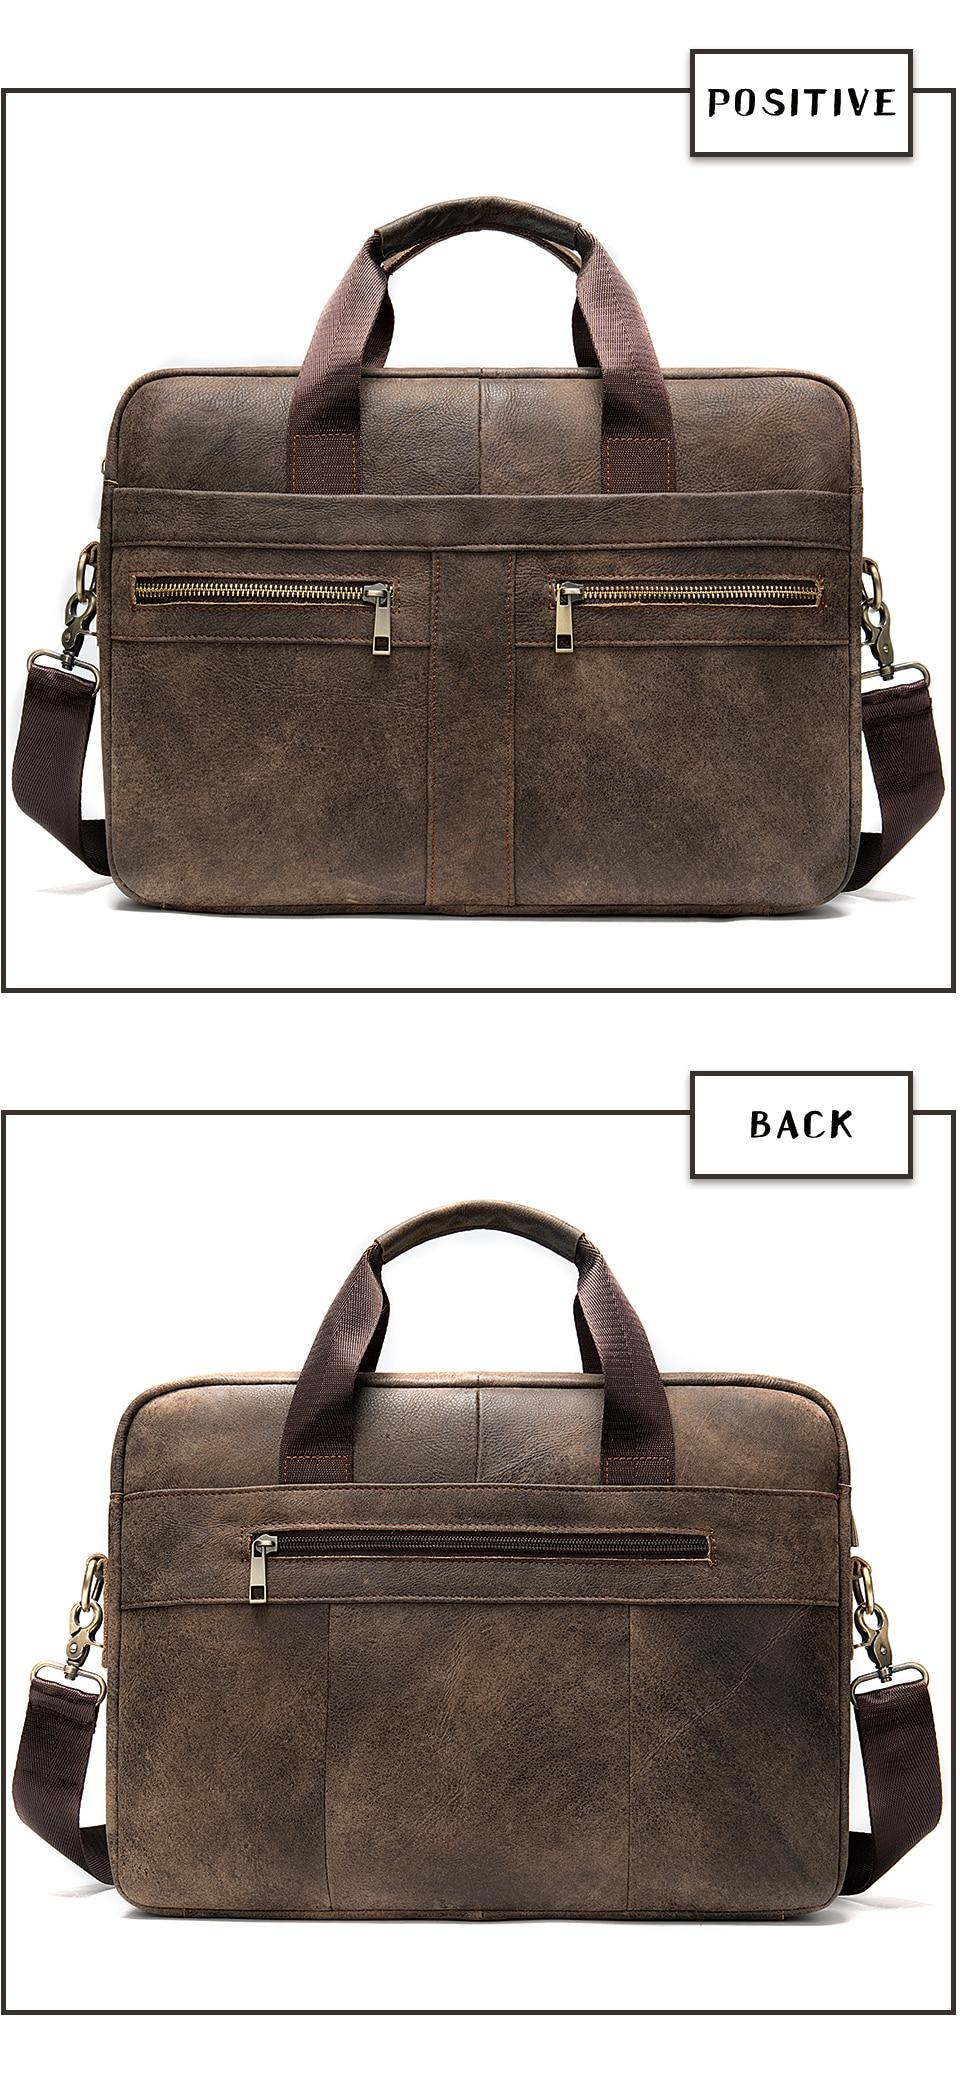 HTB1.fsAaVP7gK0jSZFjq6A5aXXai WESTAL Bag men's Genuine Leather briefcase Male man laptop bag natural Leather for men Messenger bags men's briefcases 2019